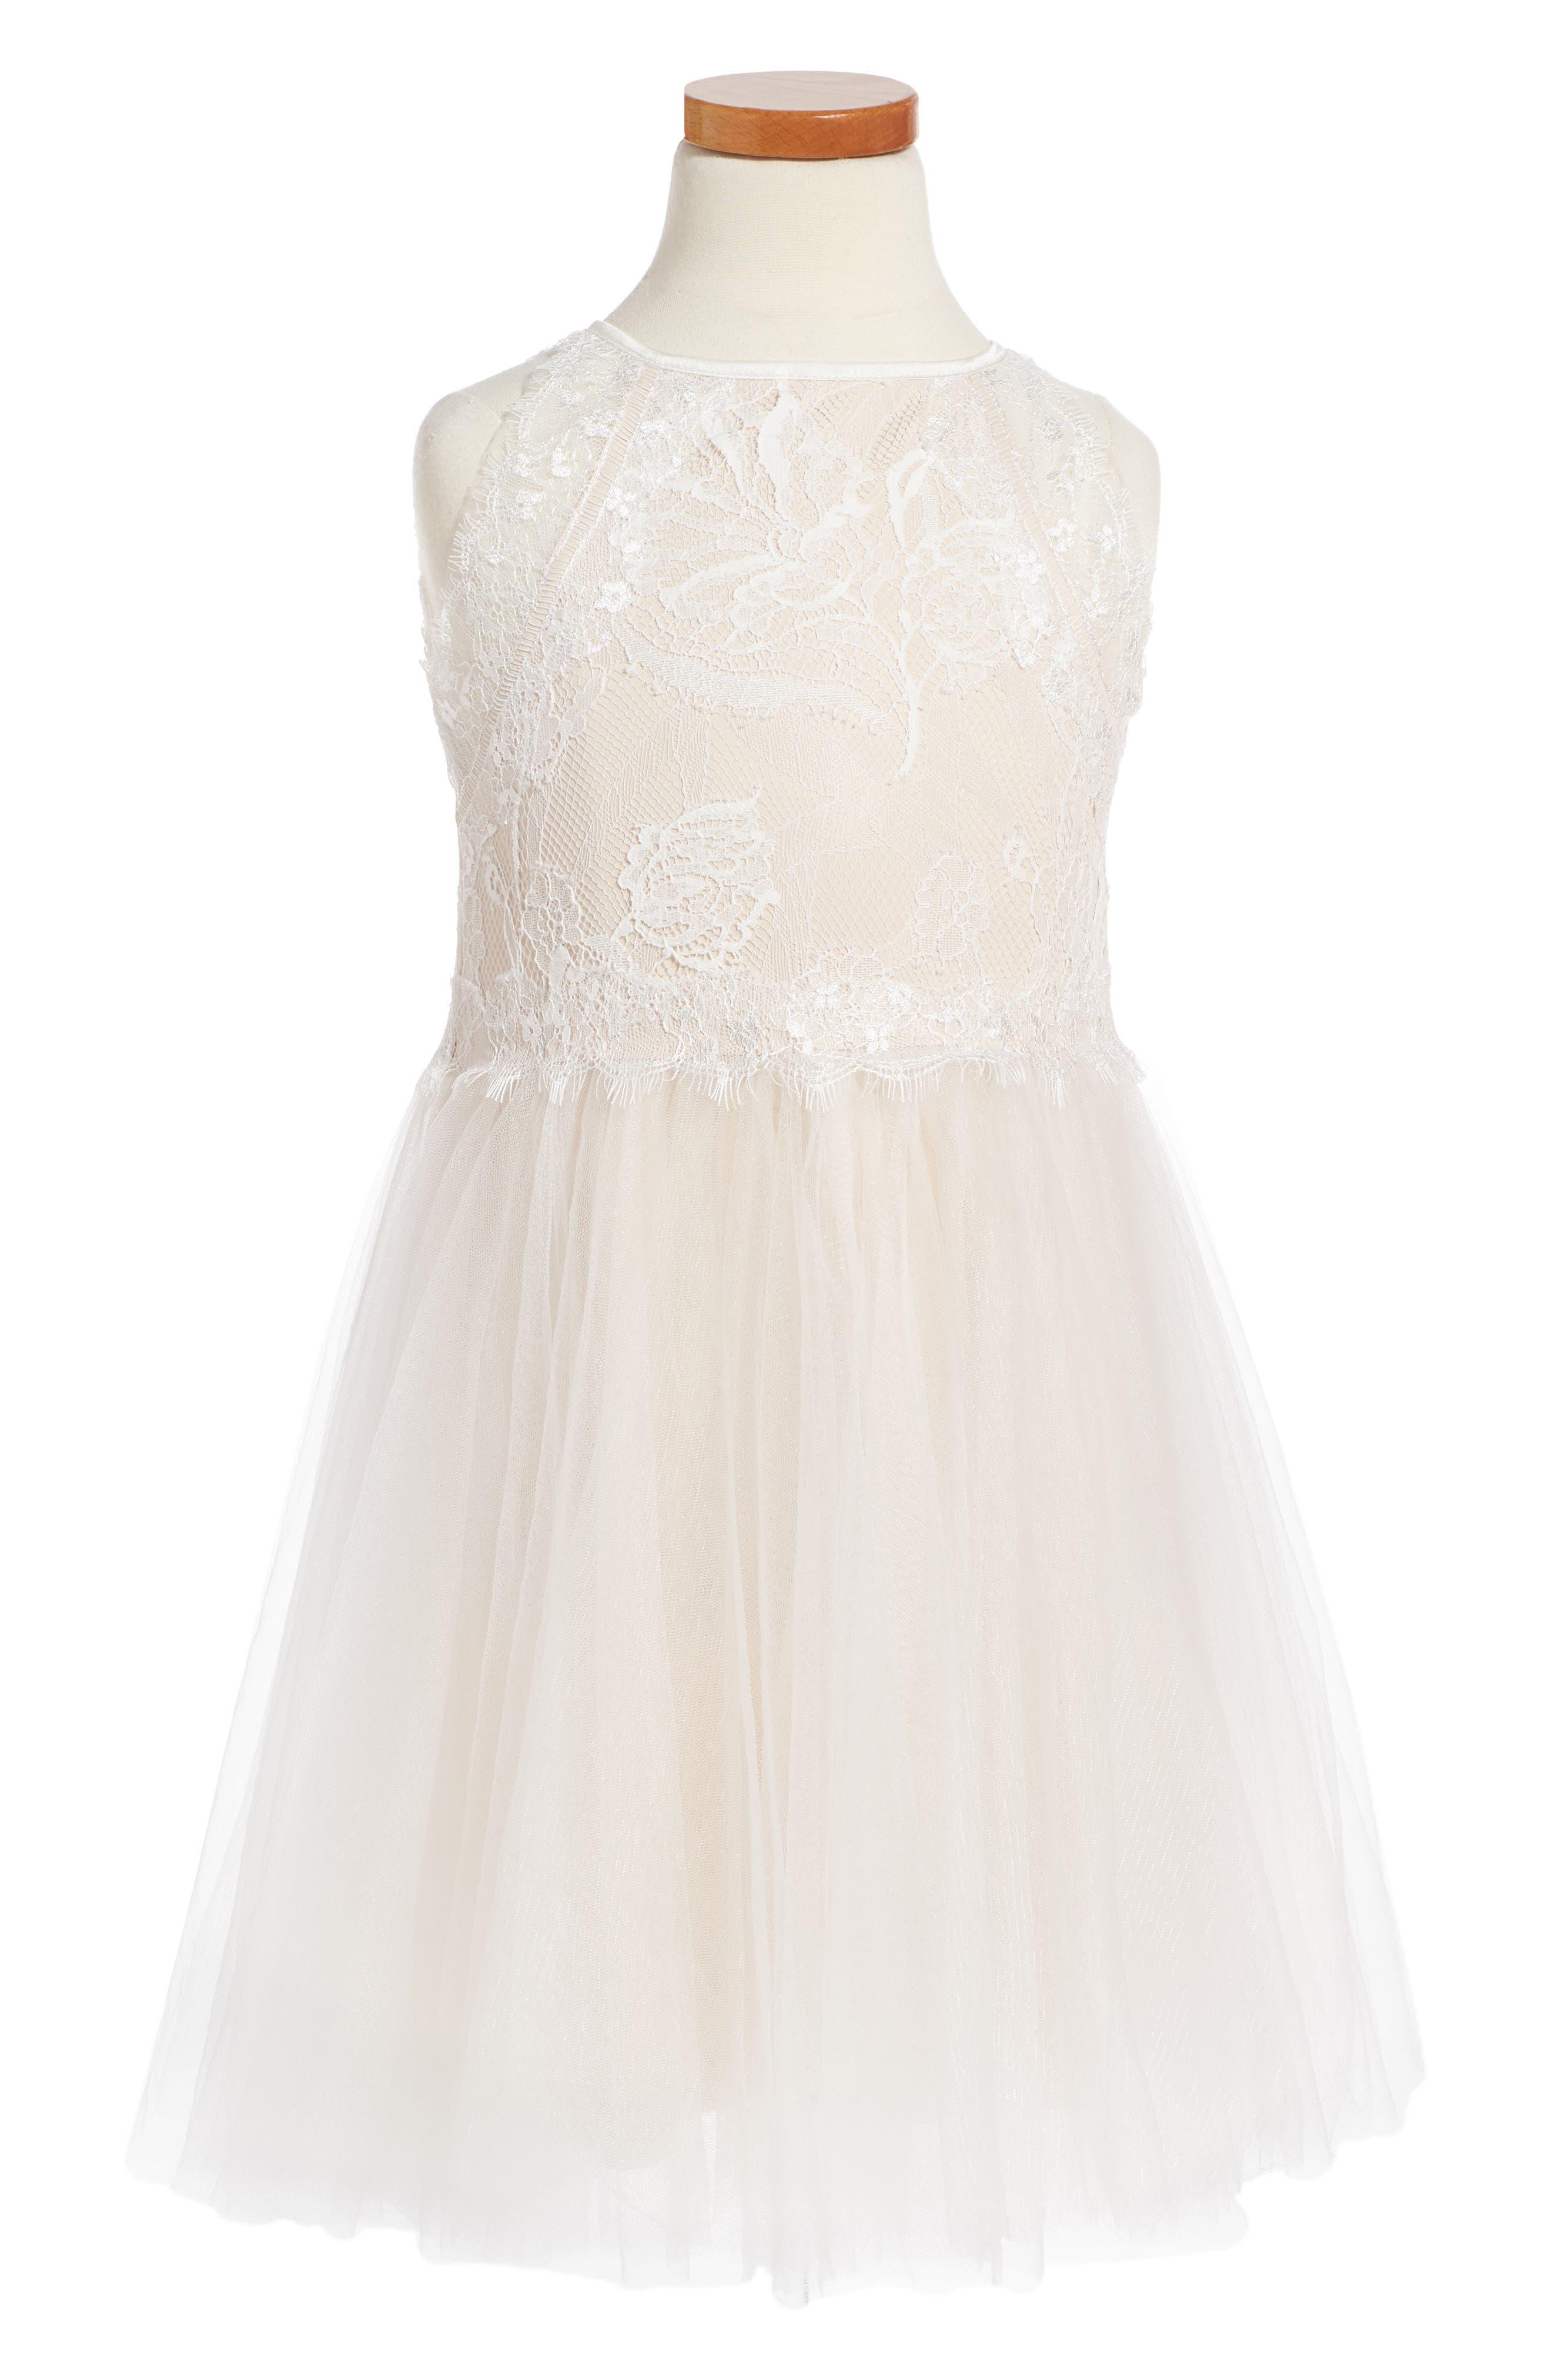 Sleeveless Lace Dress,                         Main,                         color, Ivory/ Petal